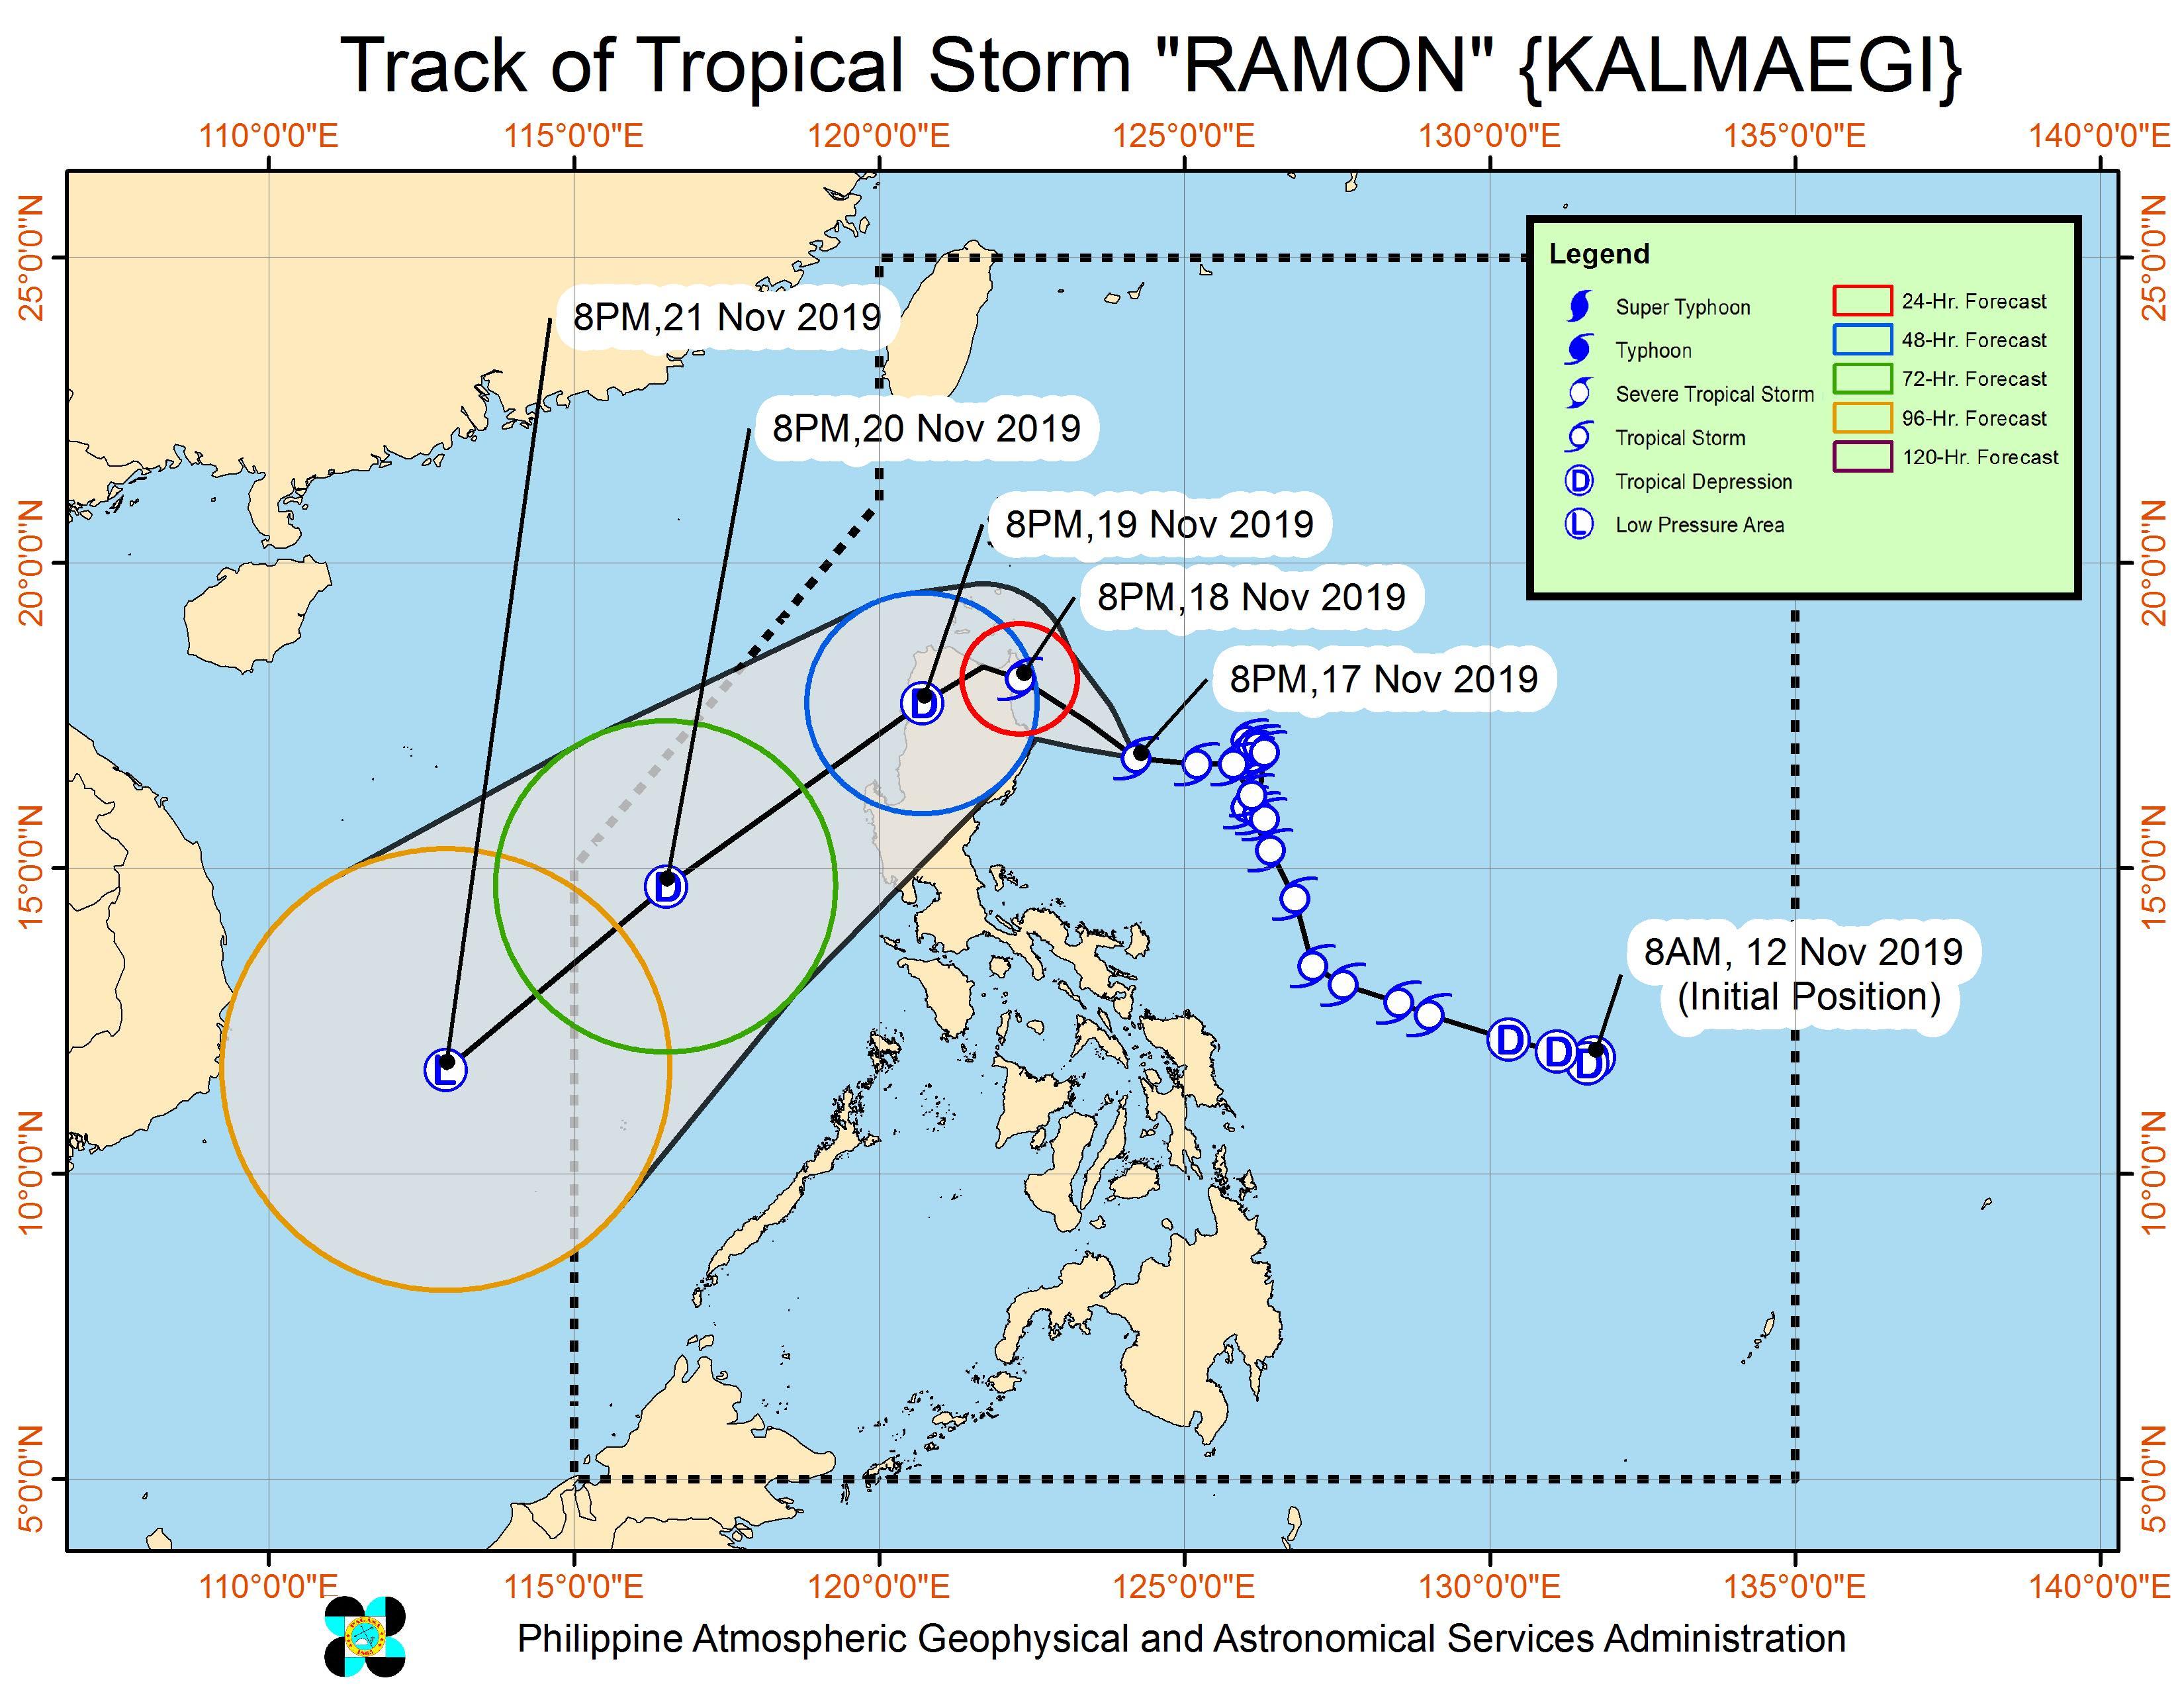 Forecast track of Tropical Storm Ramon (Kalmaegi) as of November 17, 2019, 11 pm. Image from PAGASA